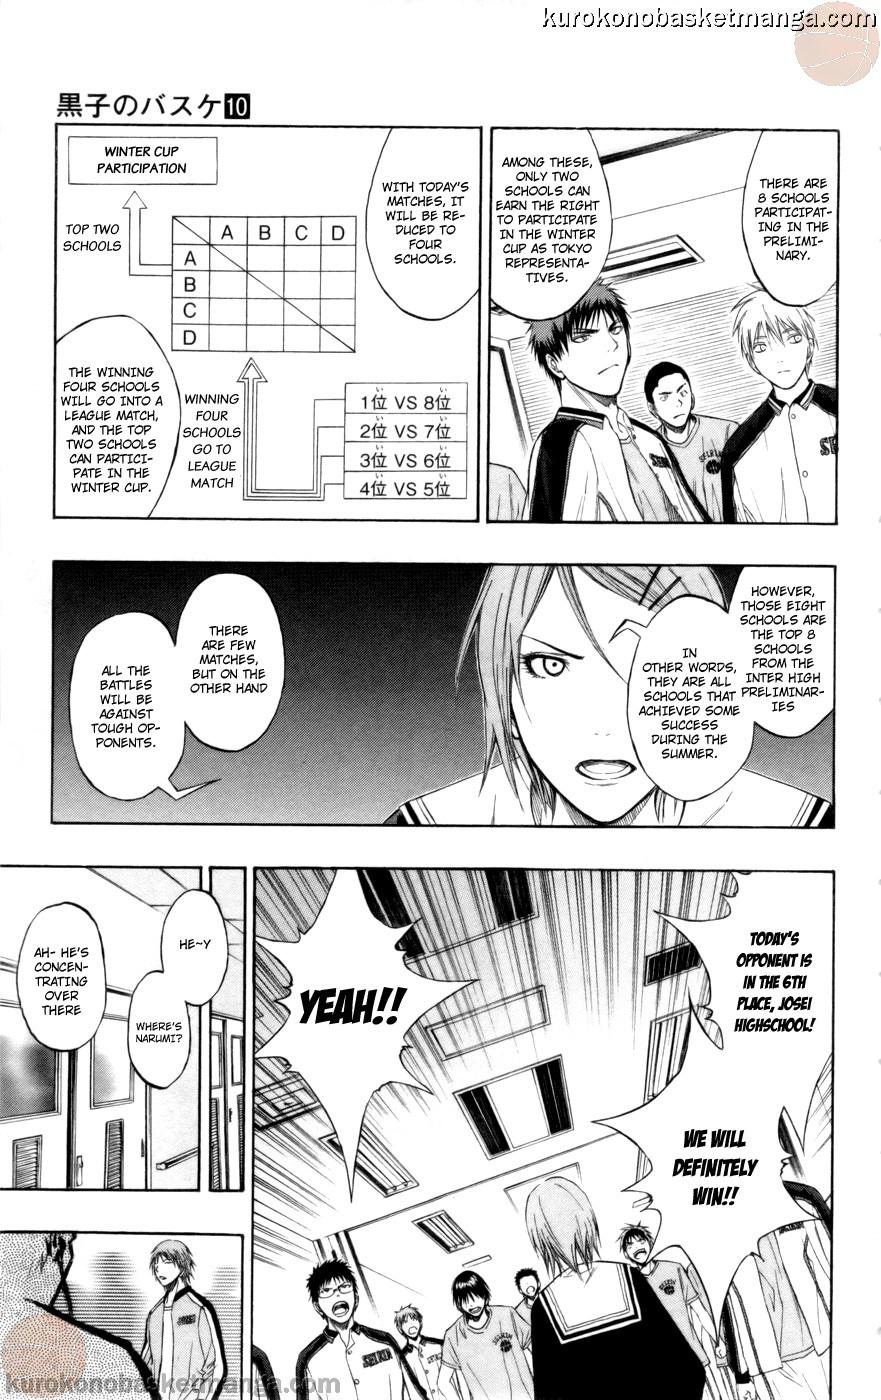 Kuroko no Basket Manga Chapter 81 - Image 17